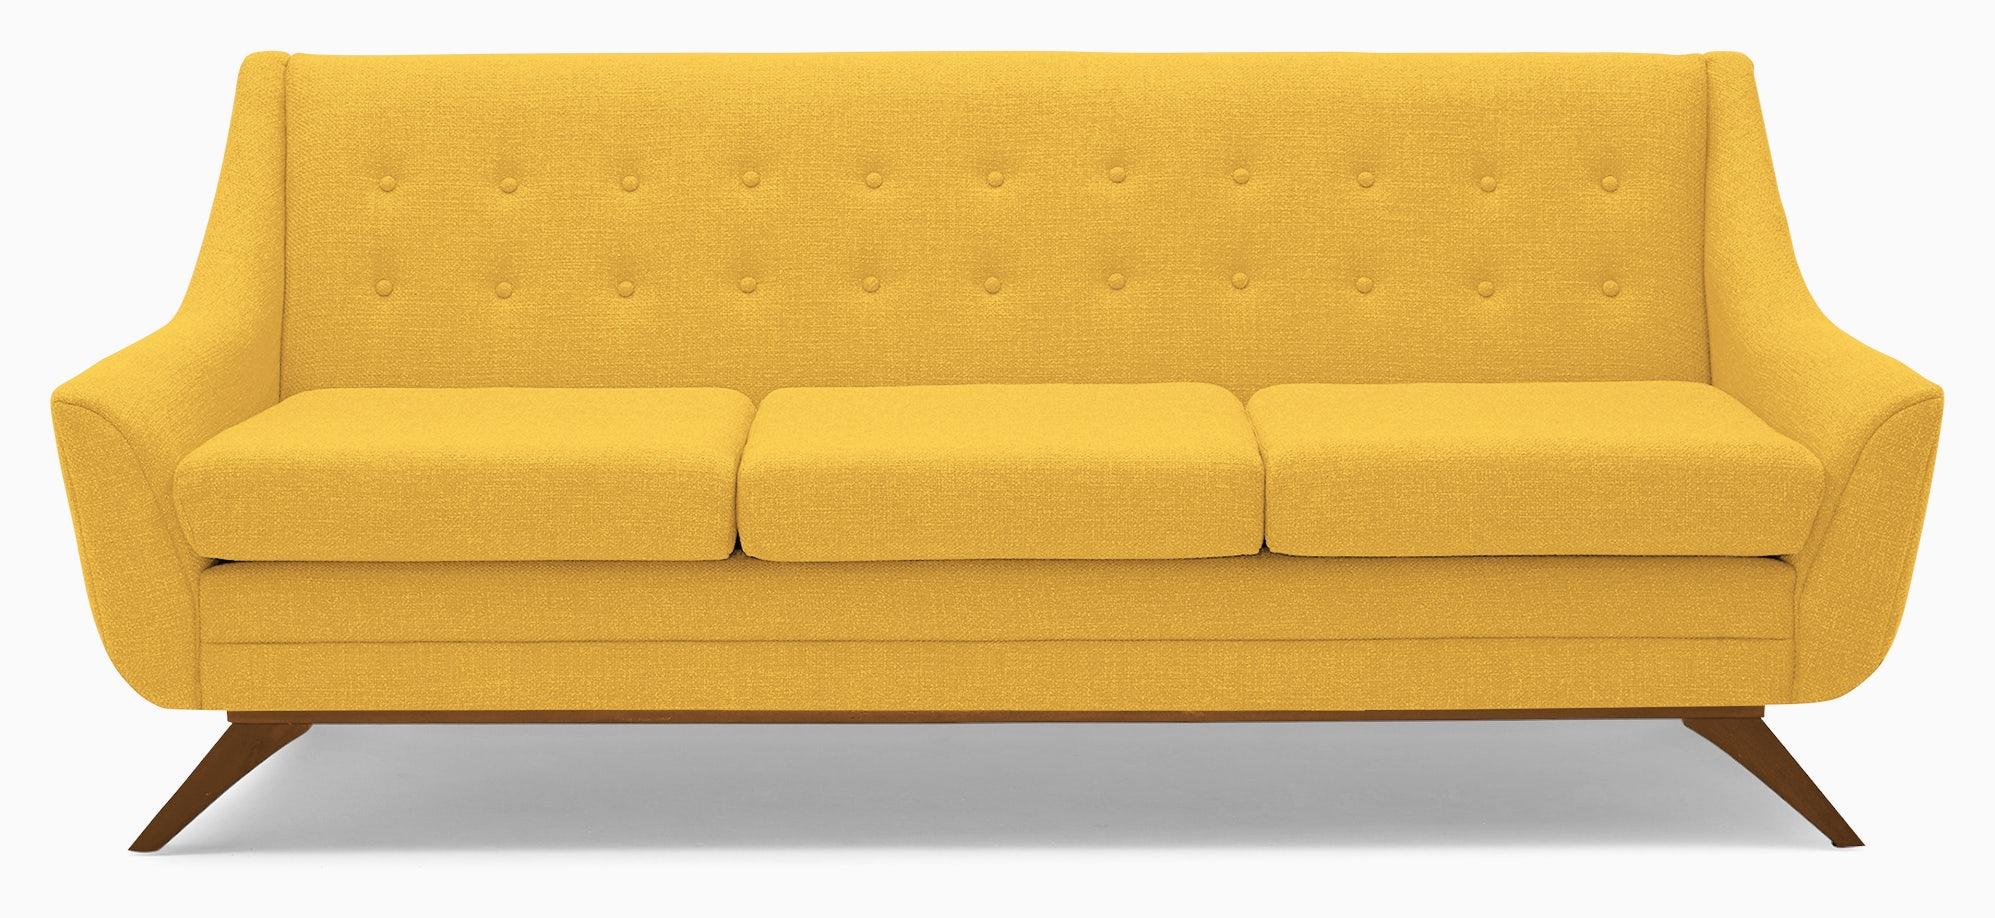 aubrey sofa bentley daisey